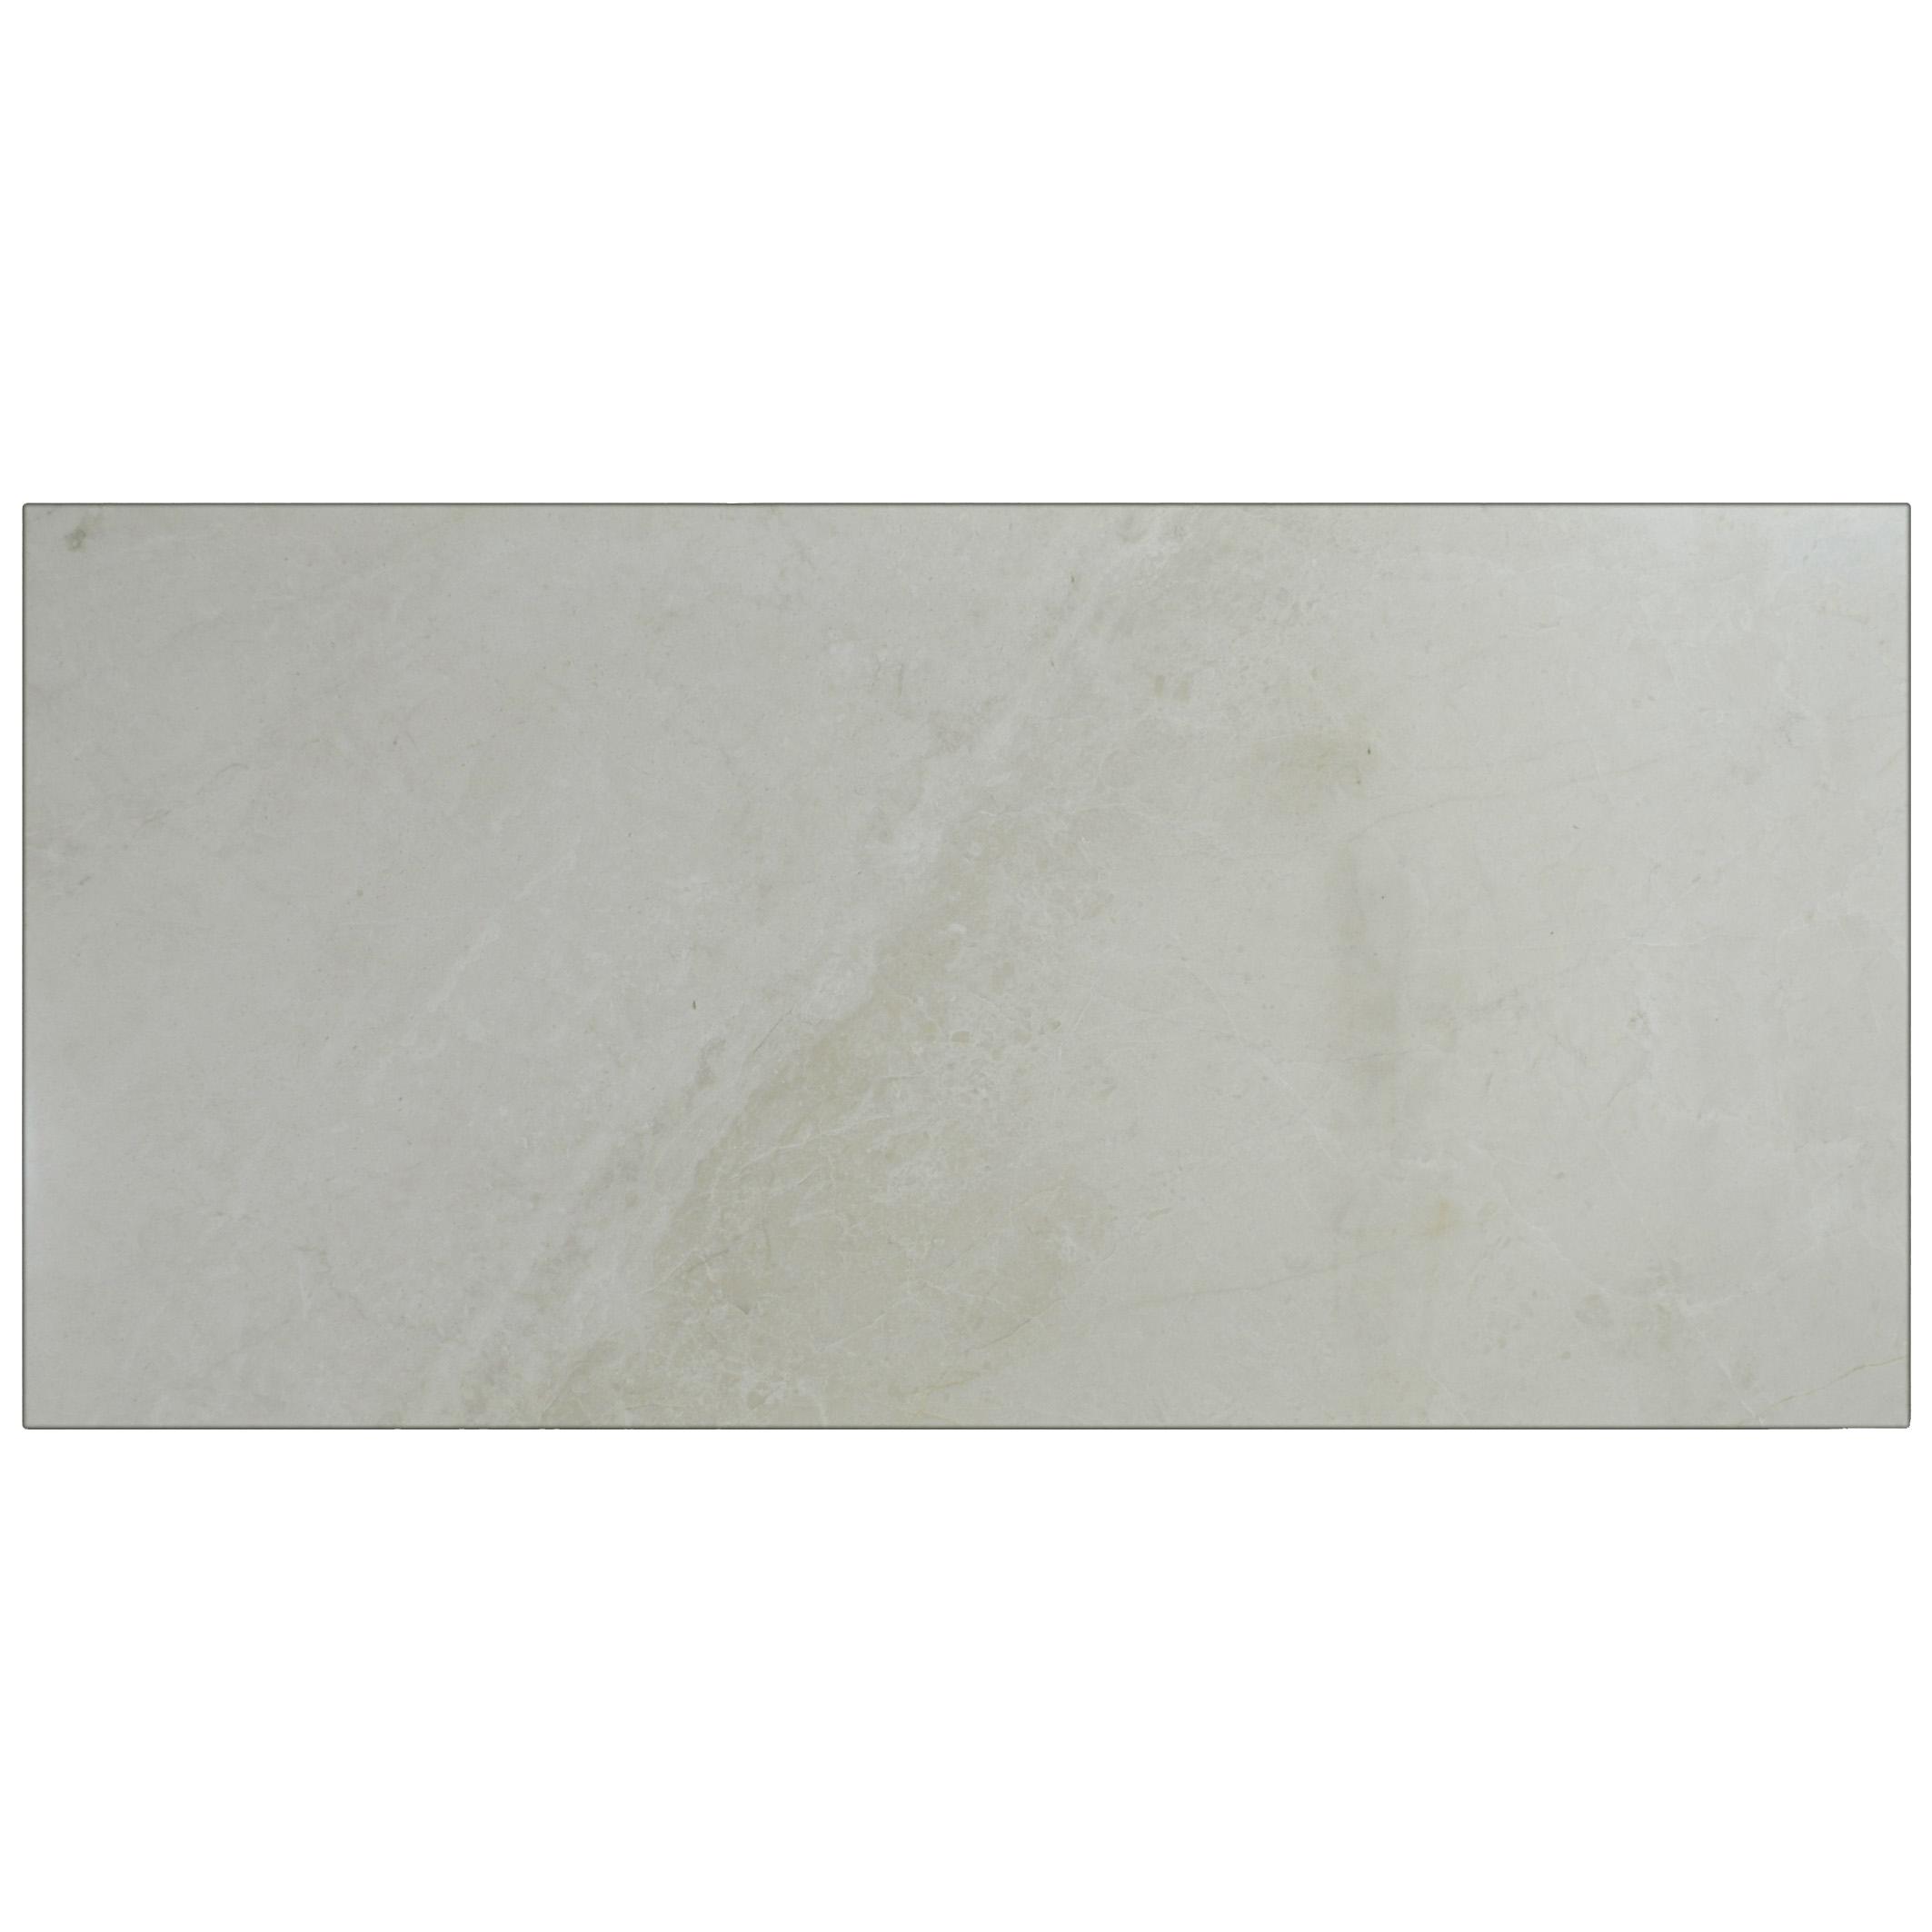 naturella beige polished marble tiles 18x36-marble sale-Atlantic Stone Source